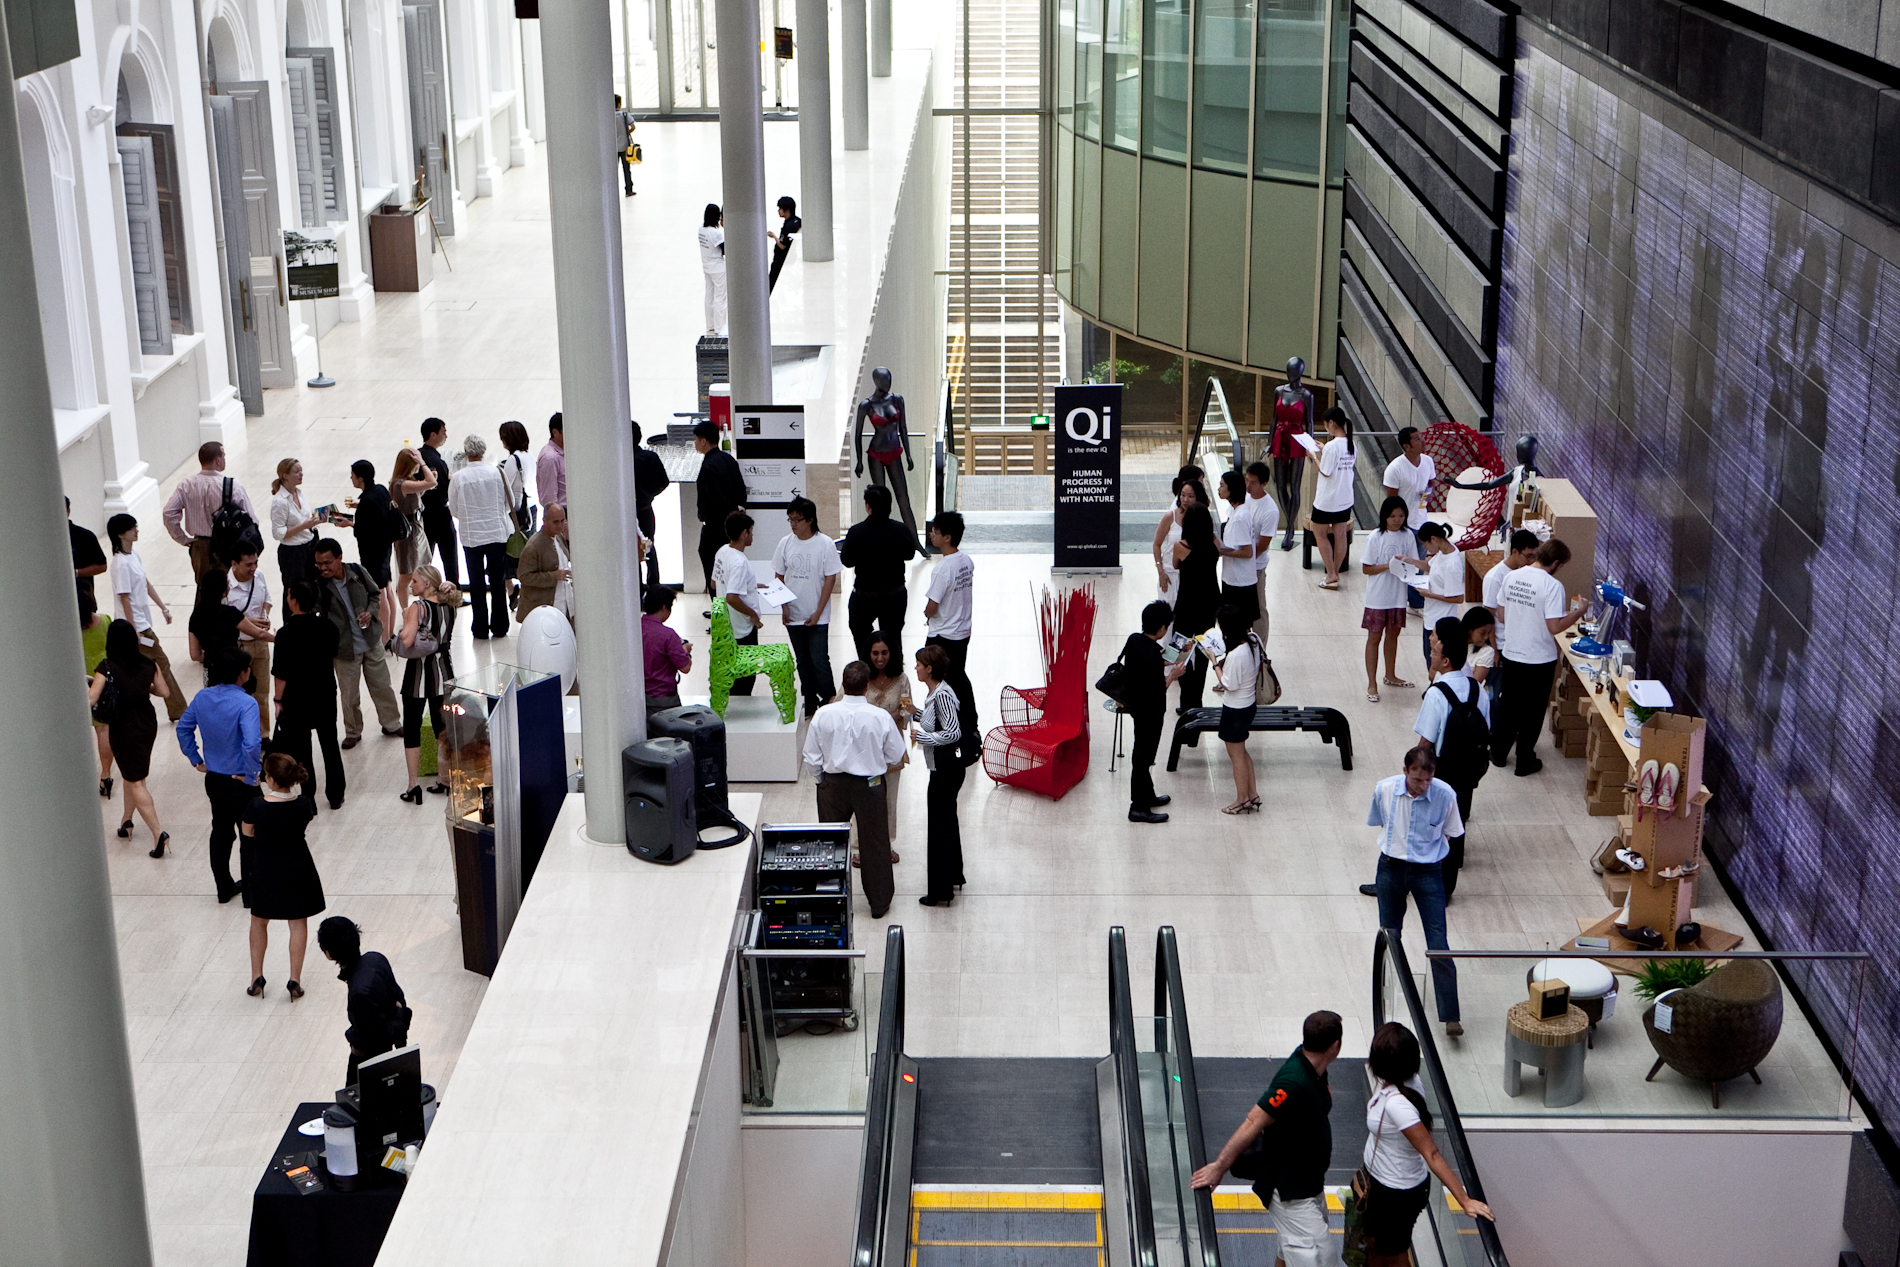 qi-global-2009-sustaible-design-singapore-040.jpg